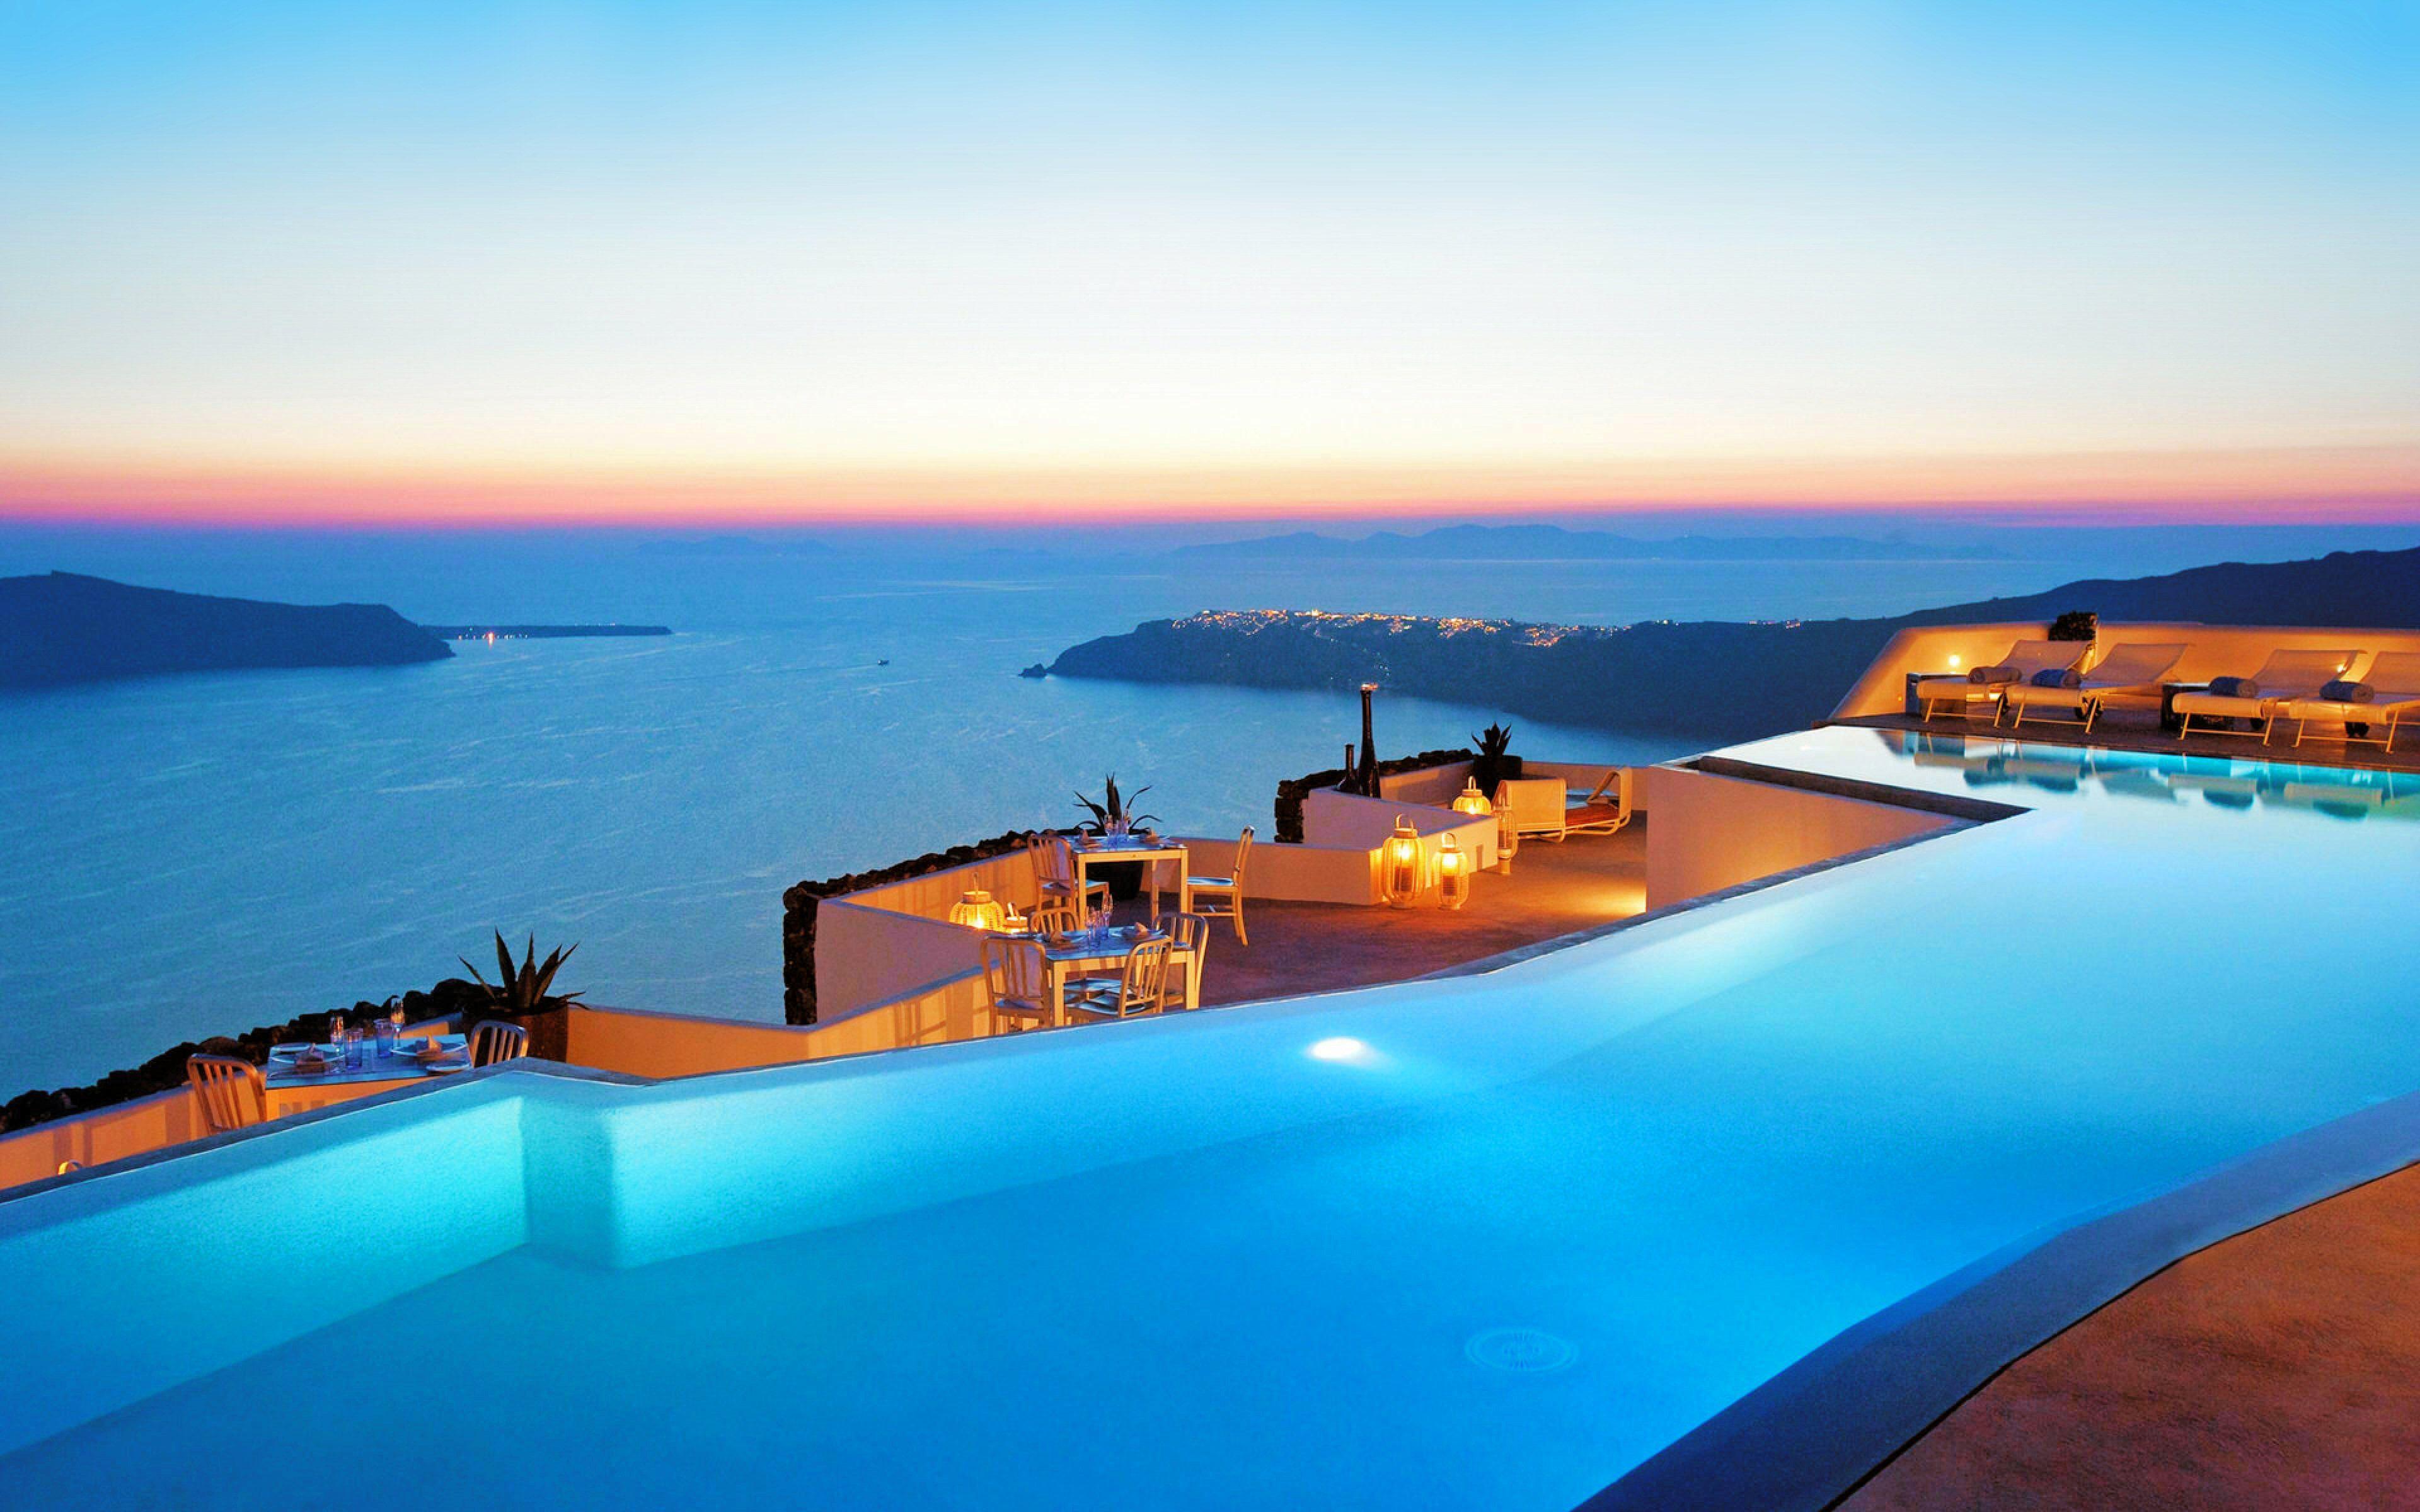 45 Santorini Sunset Wallpapers   Download at WallpaperBro 3840x2400